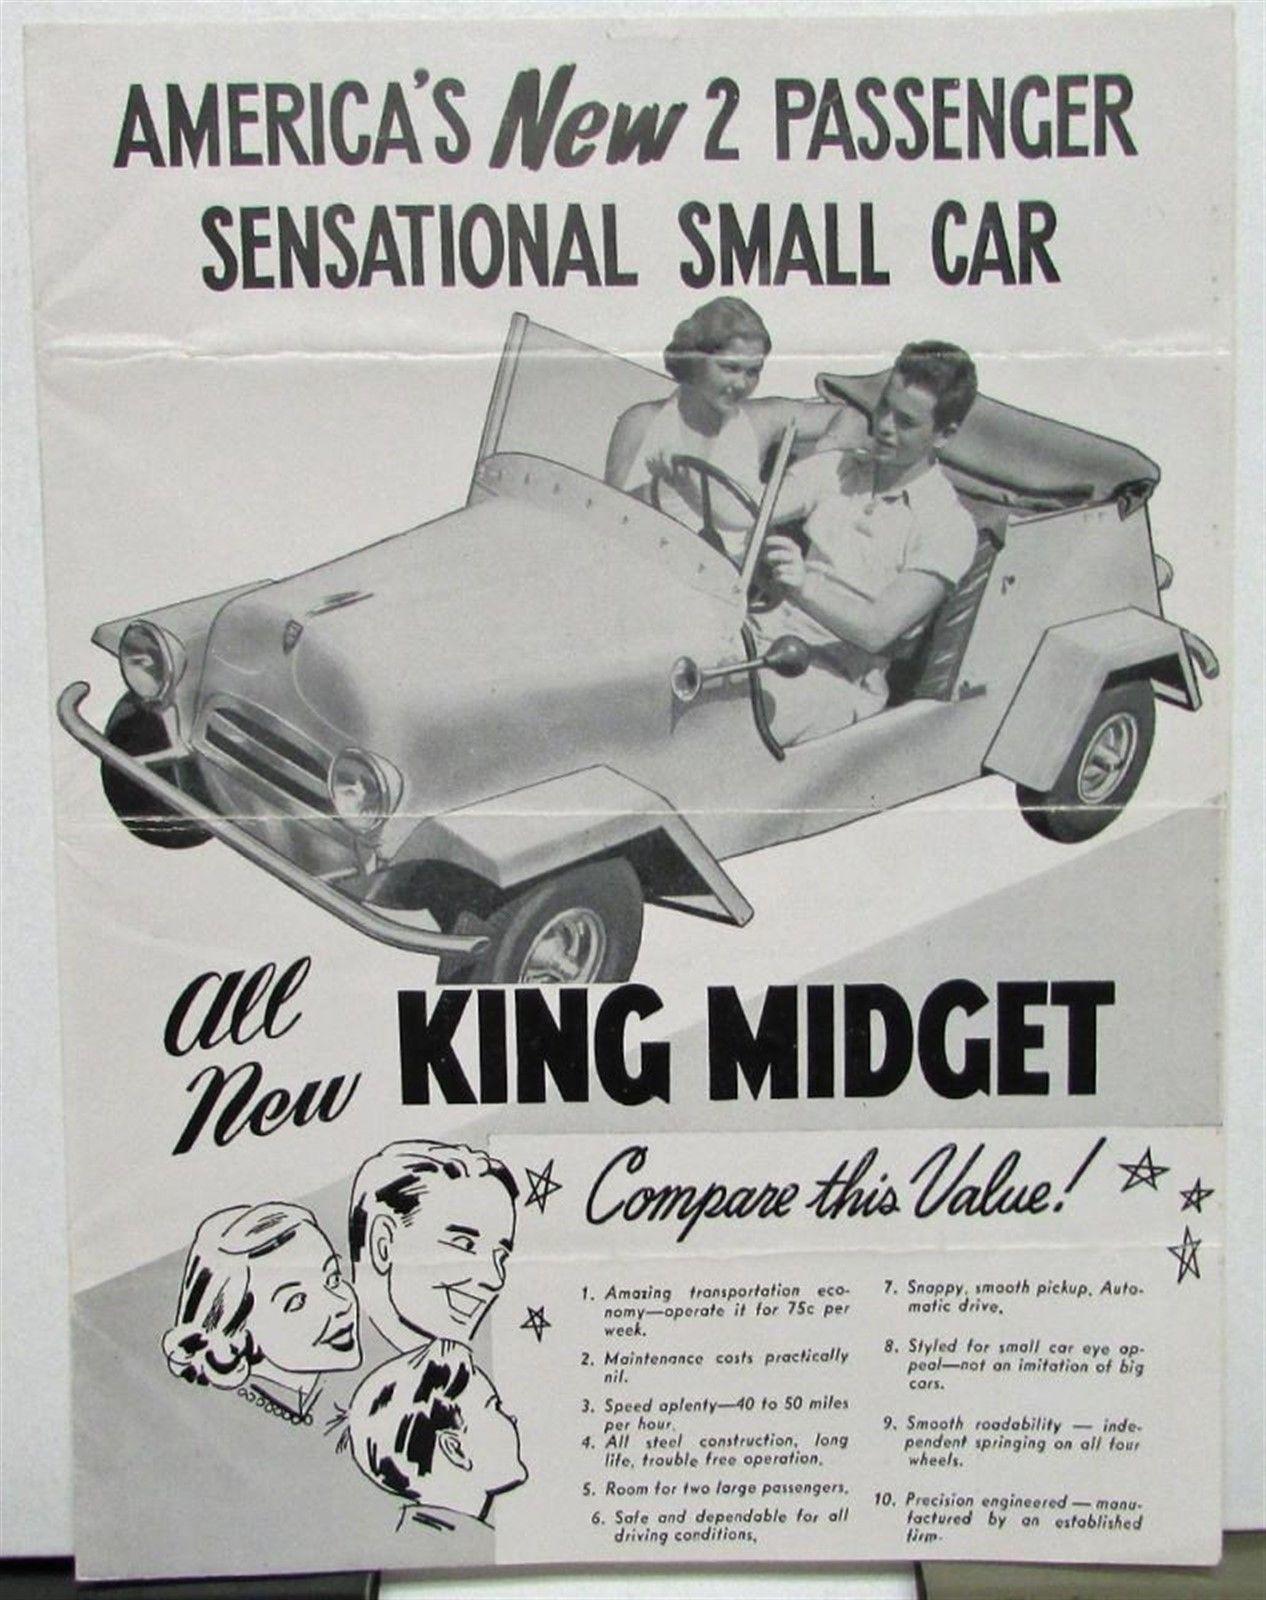 king midget car ad